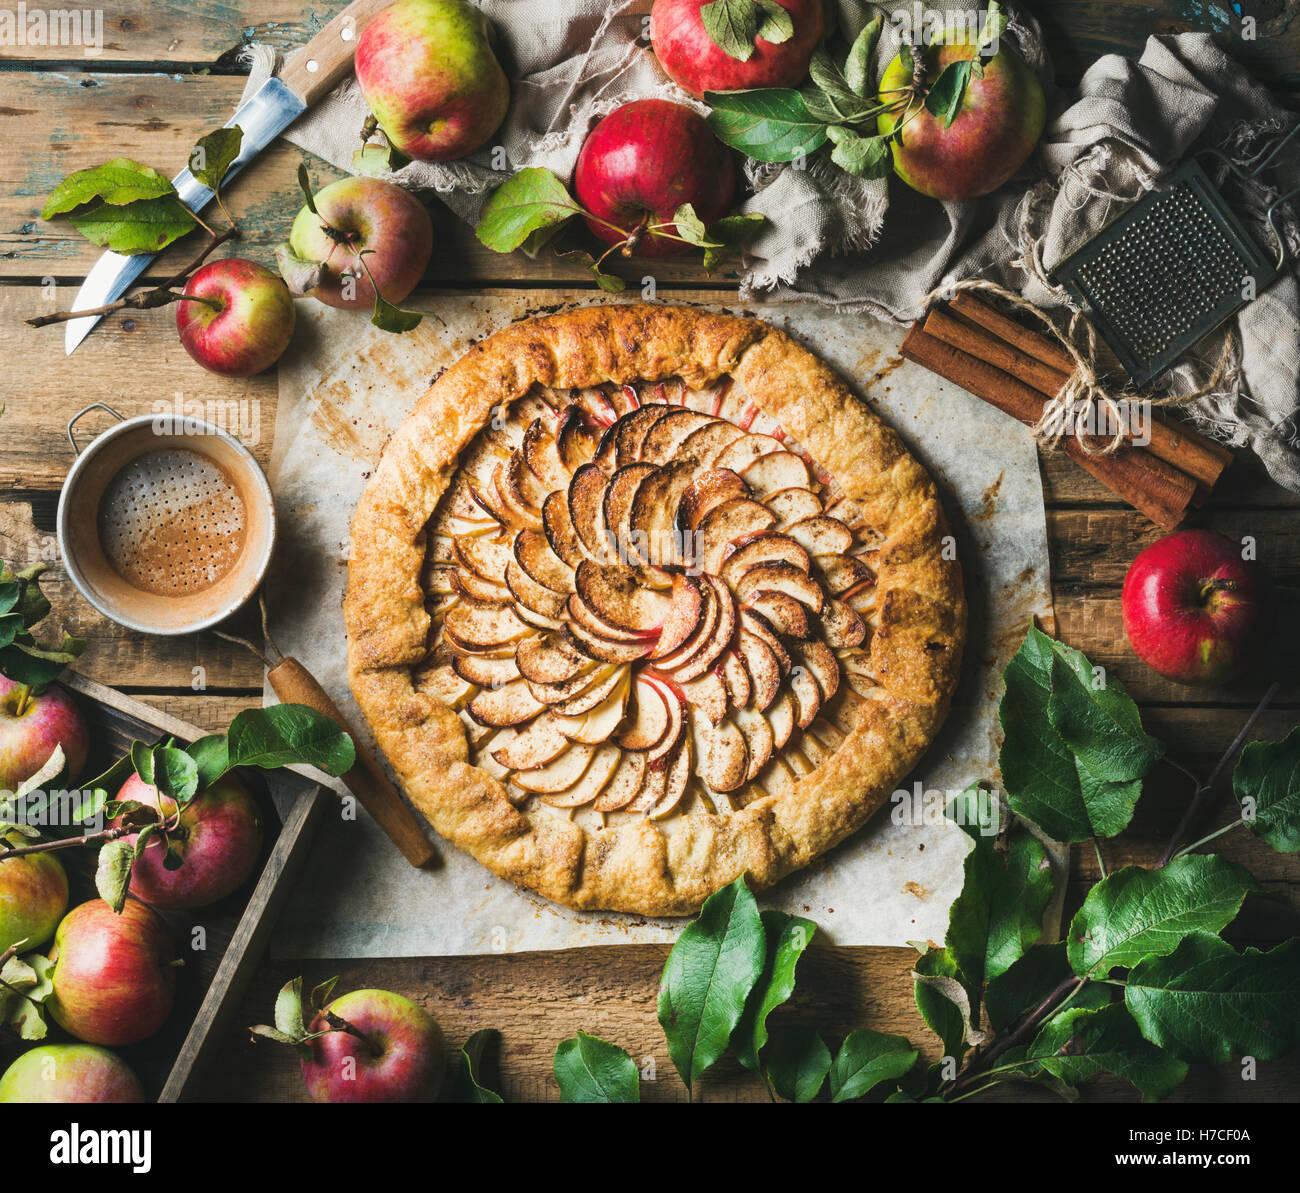 Crostata tarta de manzana con canela servidos con jardín fresco manzanas con hojas sobre fondo de madera rústica, Imagen De Stock